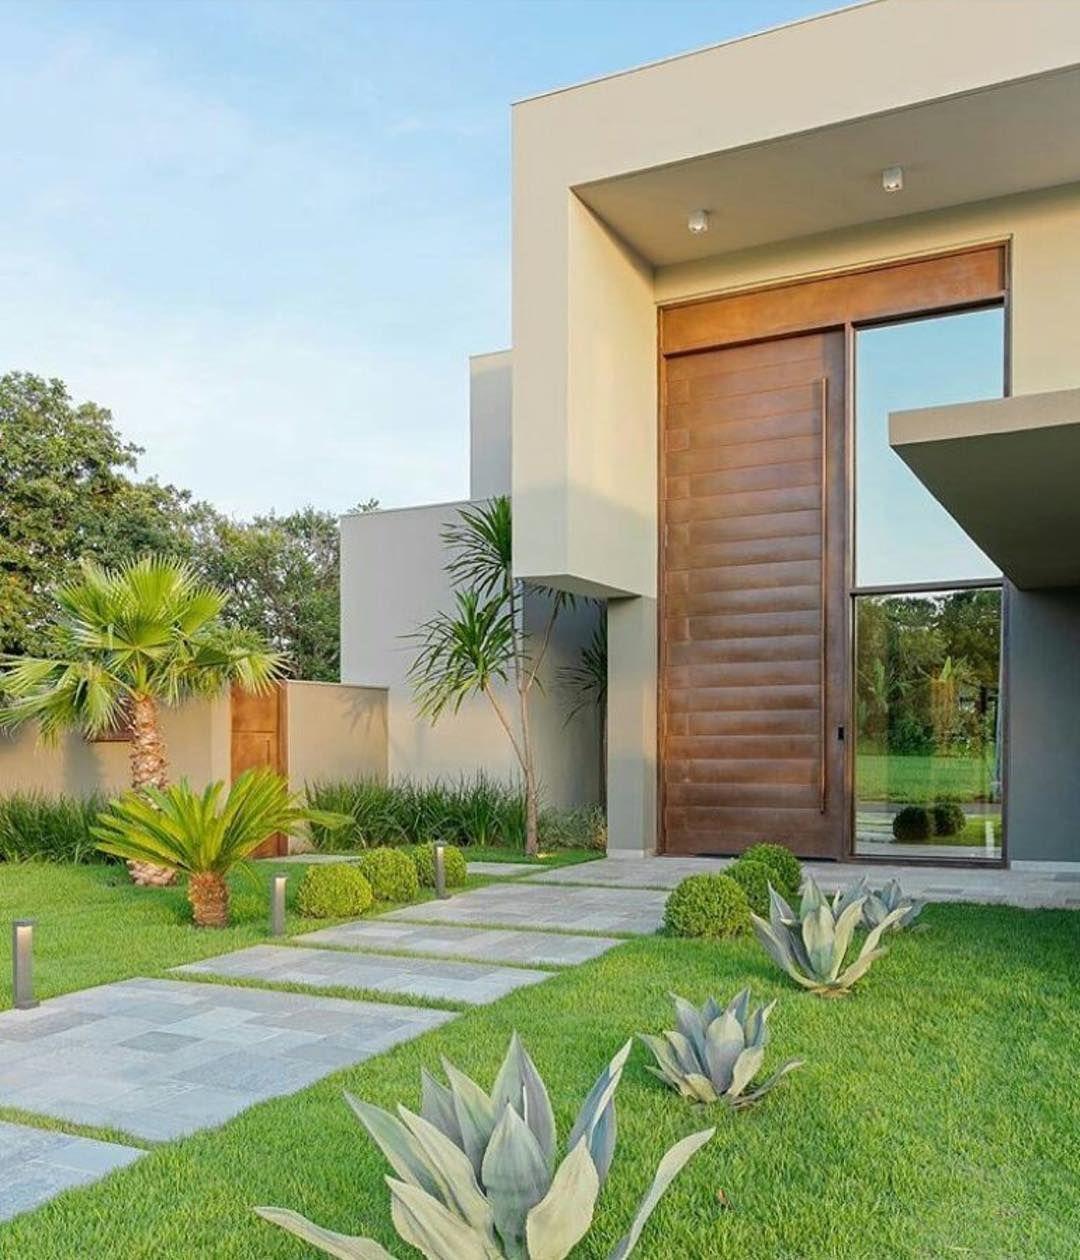 Modern window house design  follow us aadezign        architecture art artwork